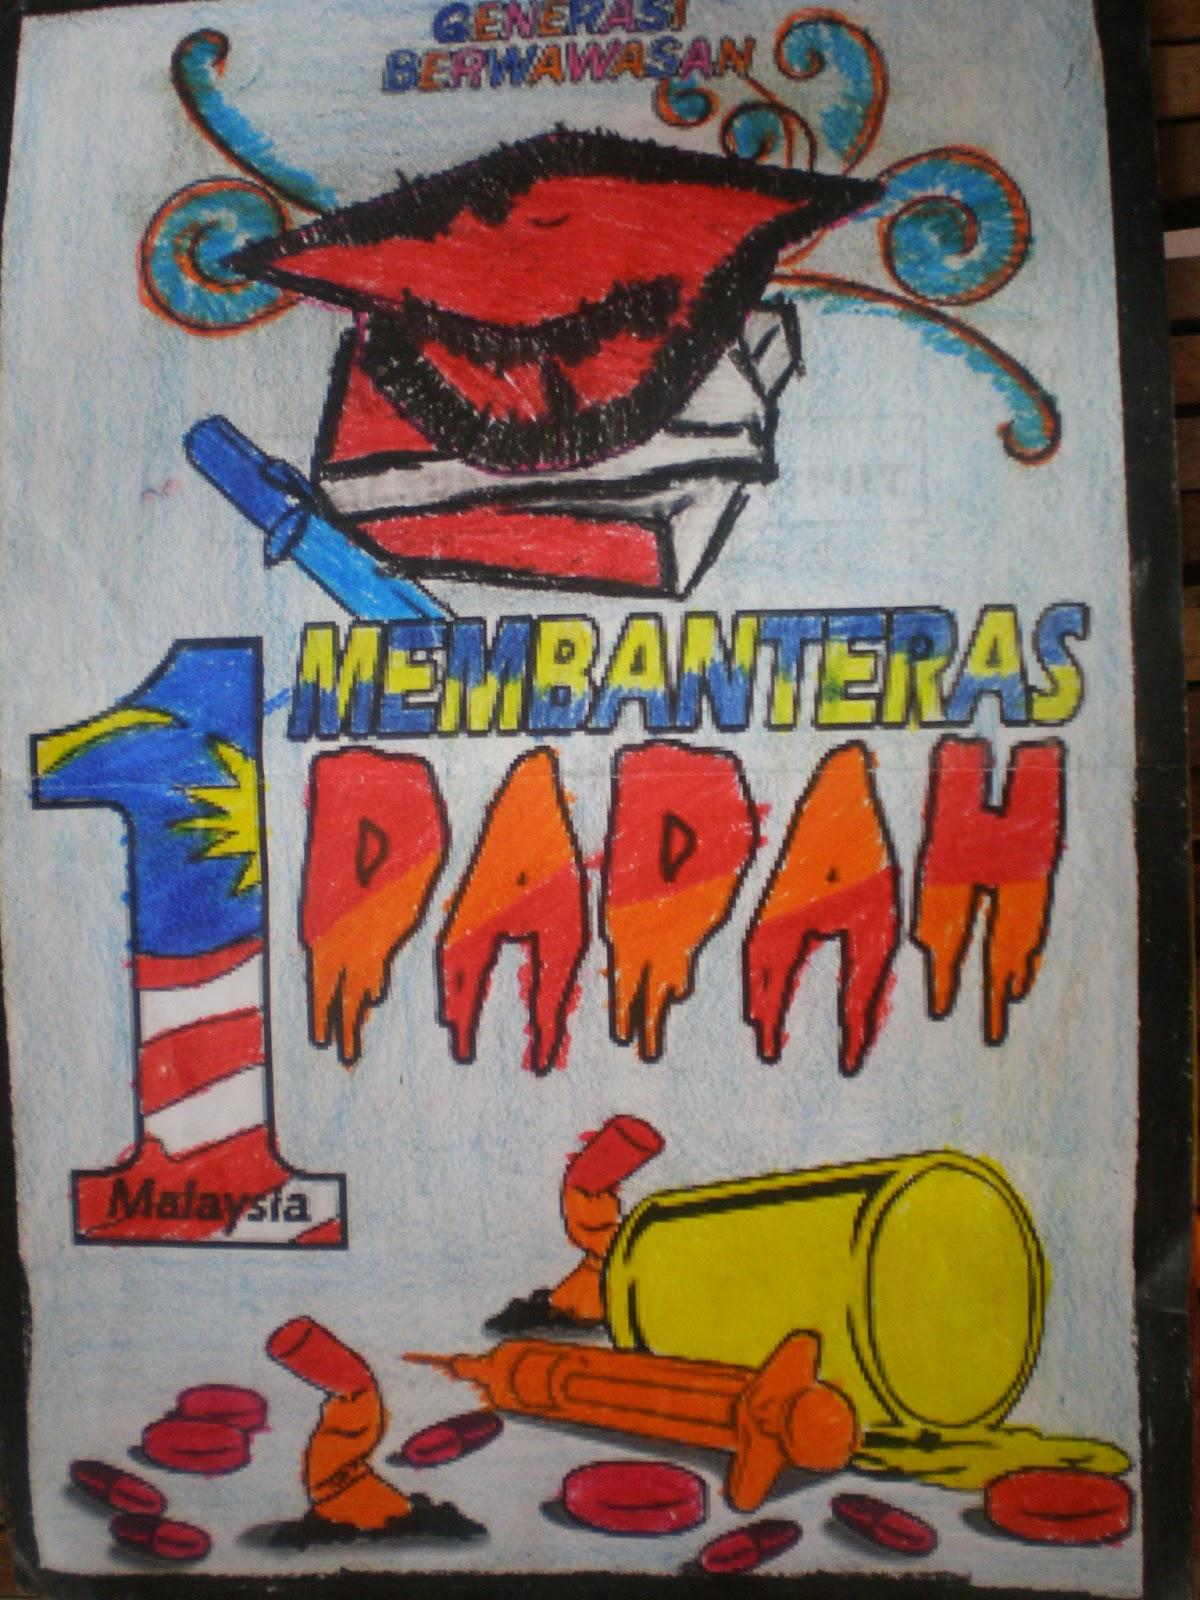 Poster dadah images galleries with a for Mural sekolah rendah